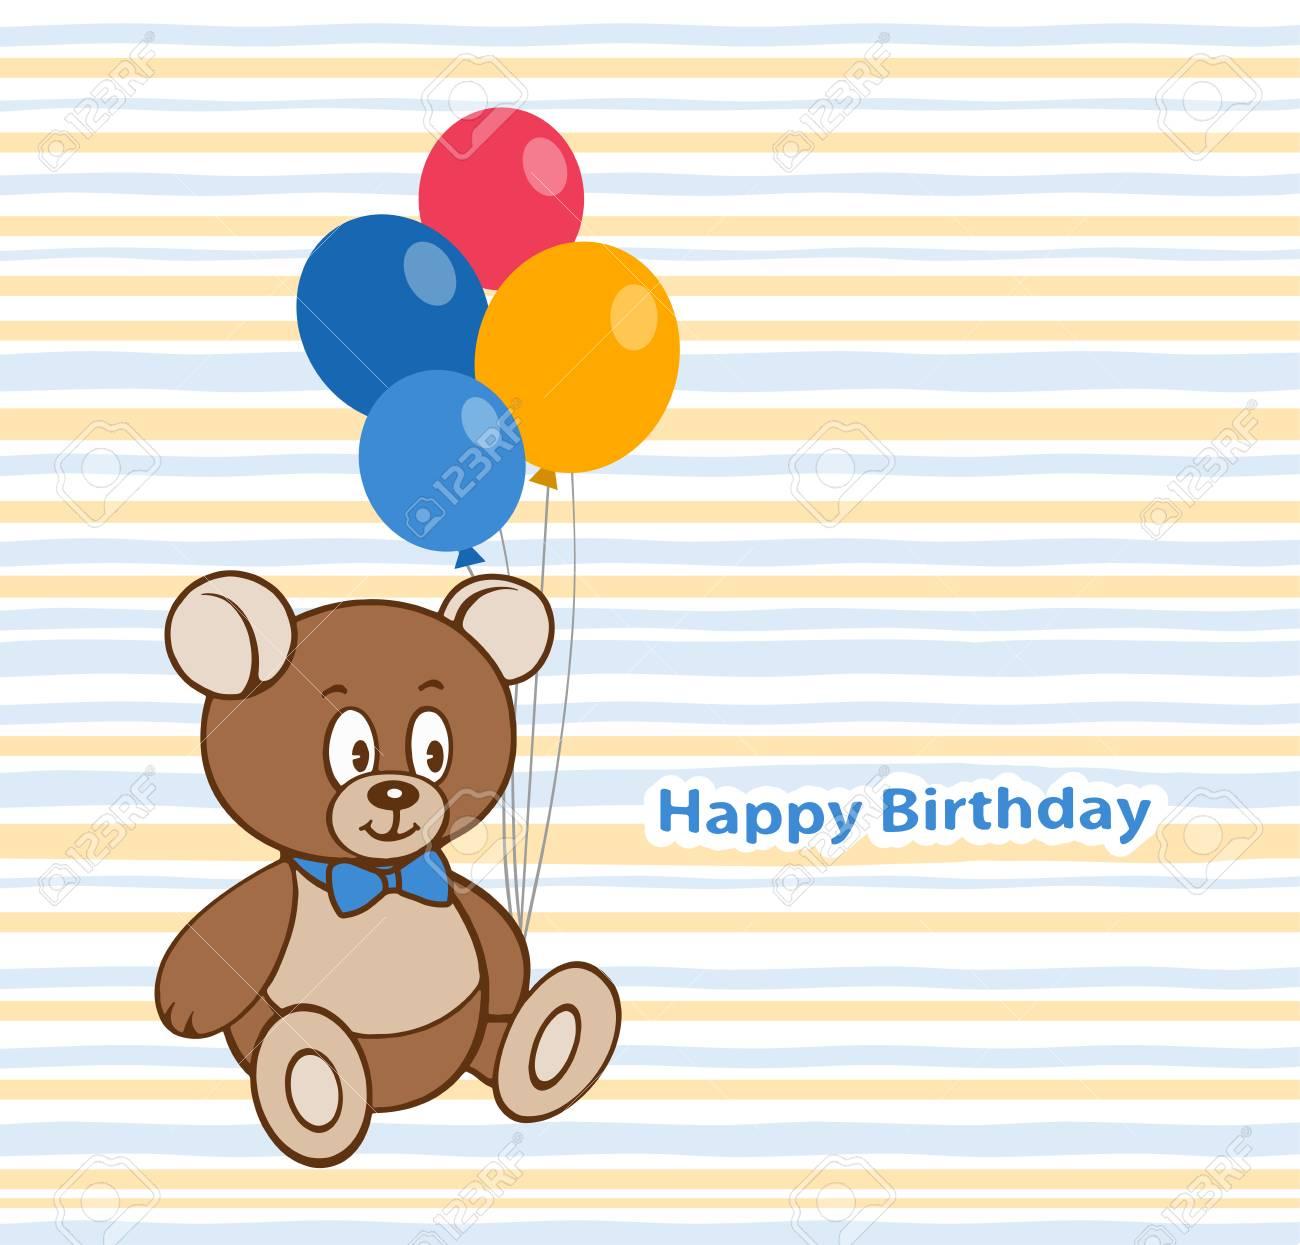 Birthday Card Design With A Cute Teddy Bear And Balloons Royalty